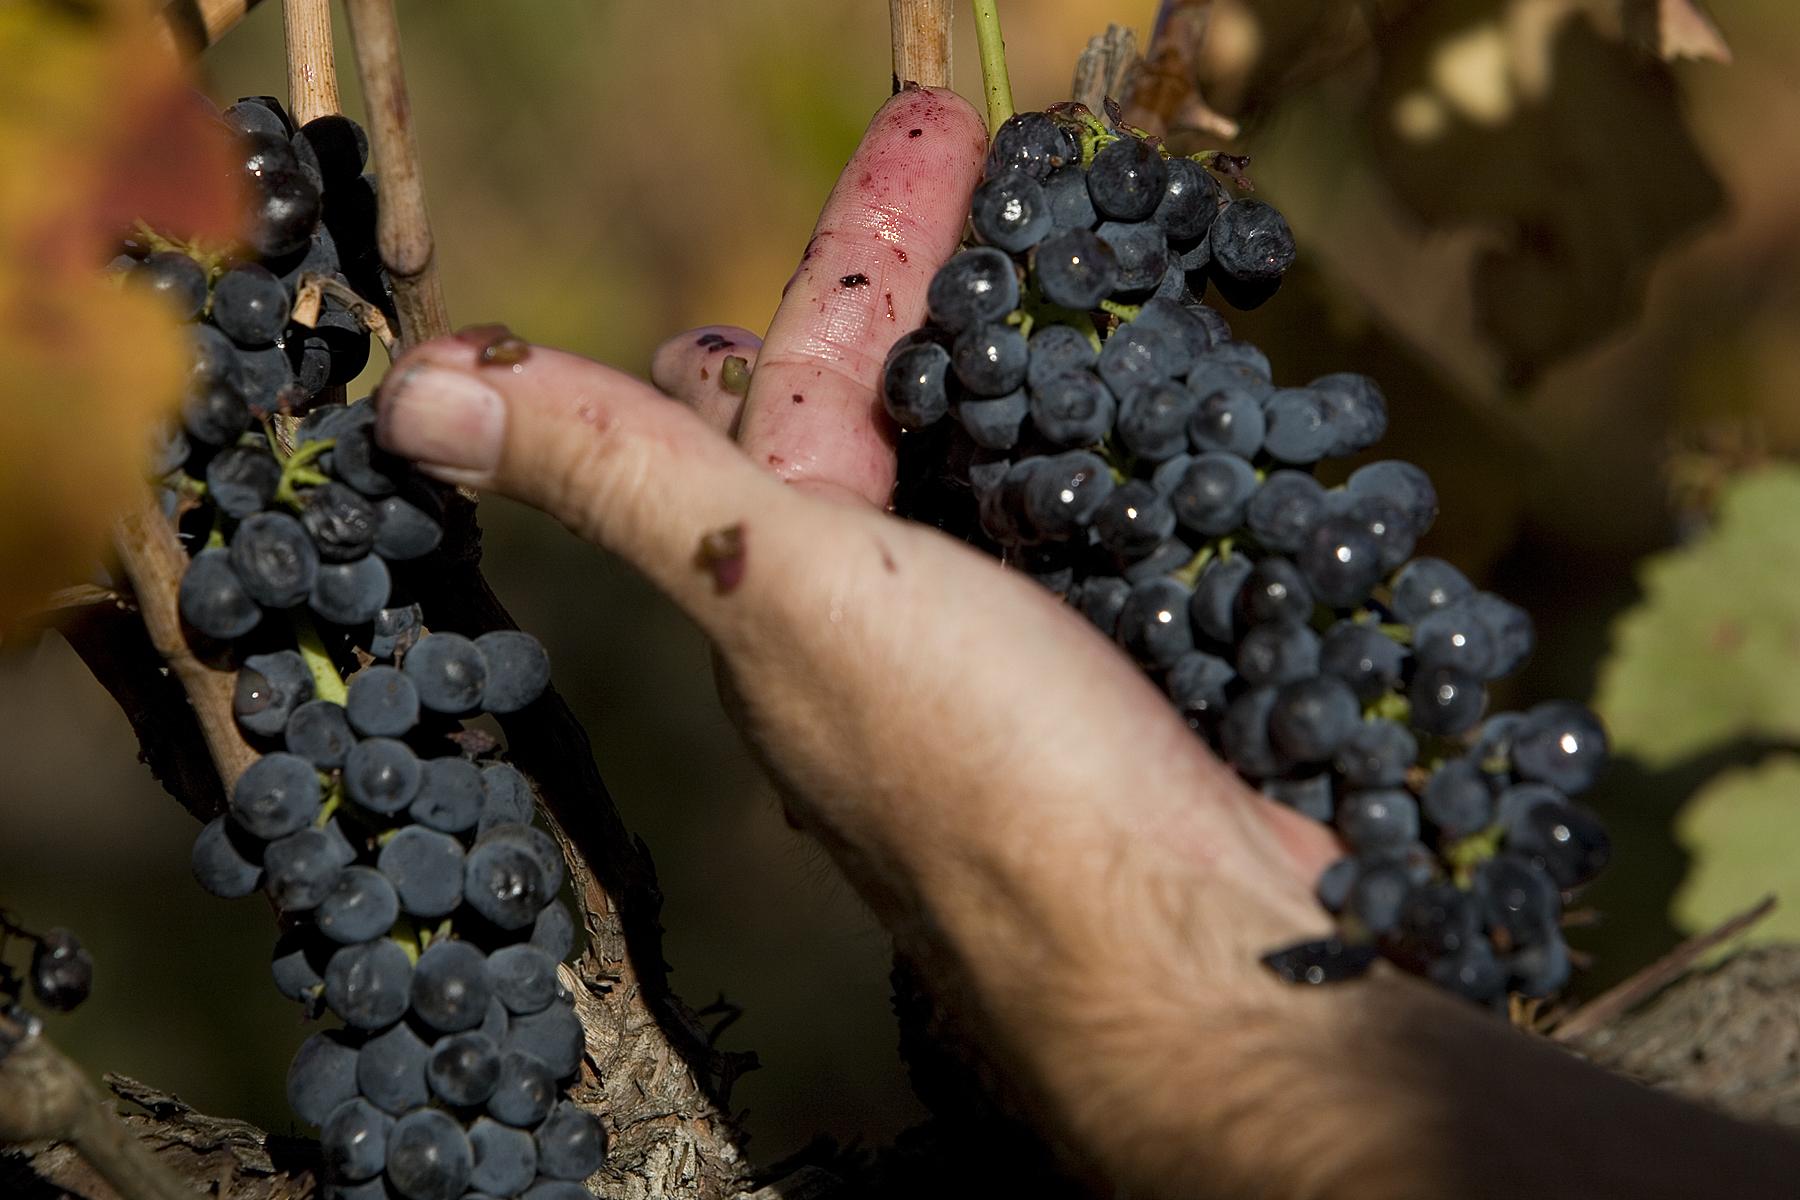 Tidswell Wines